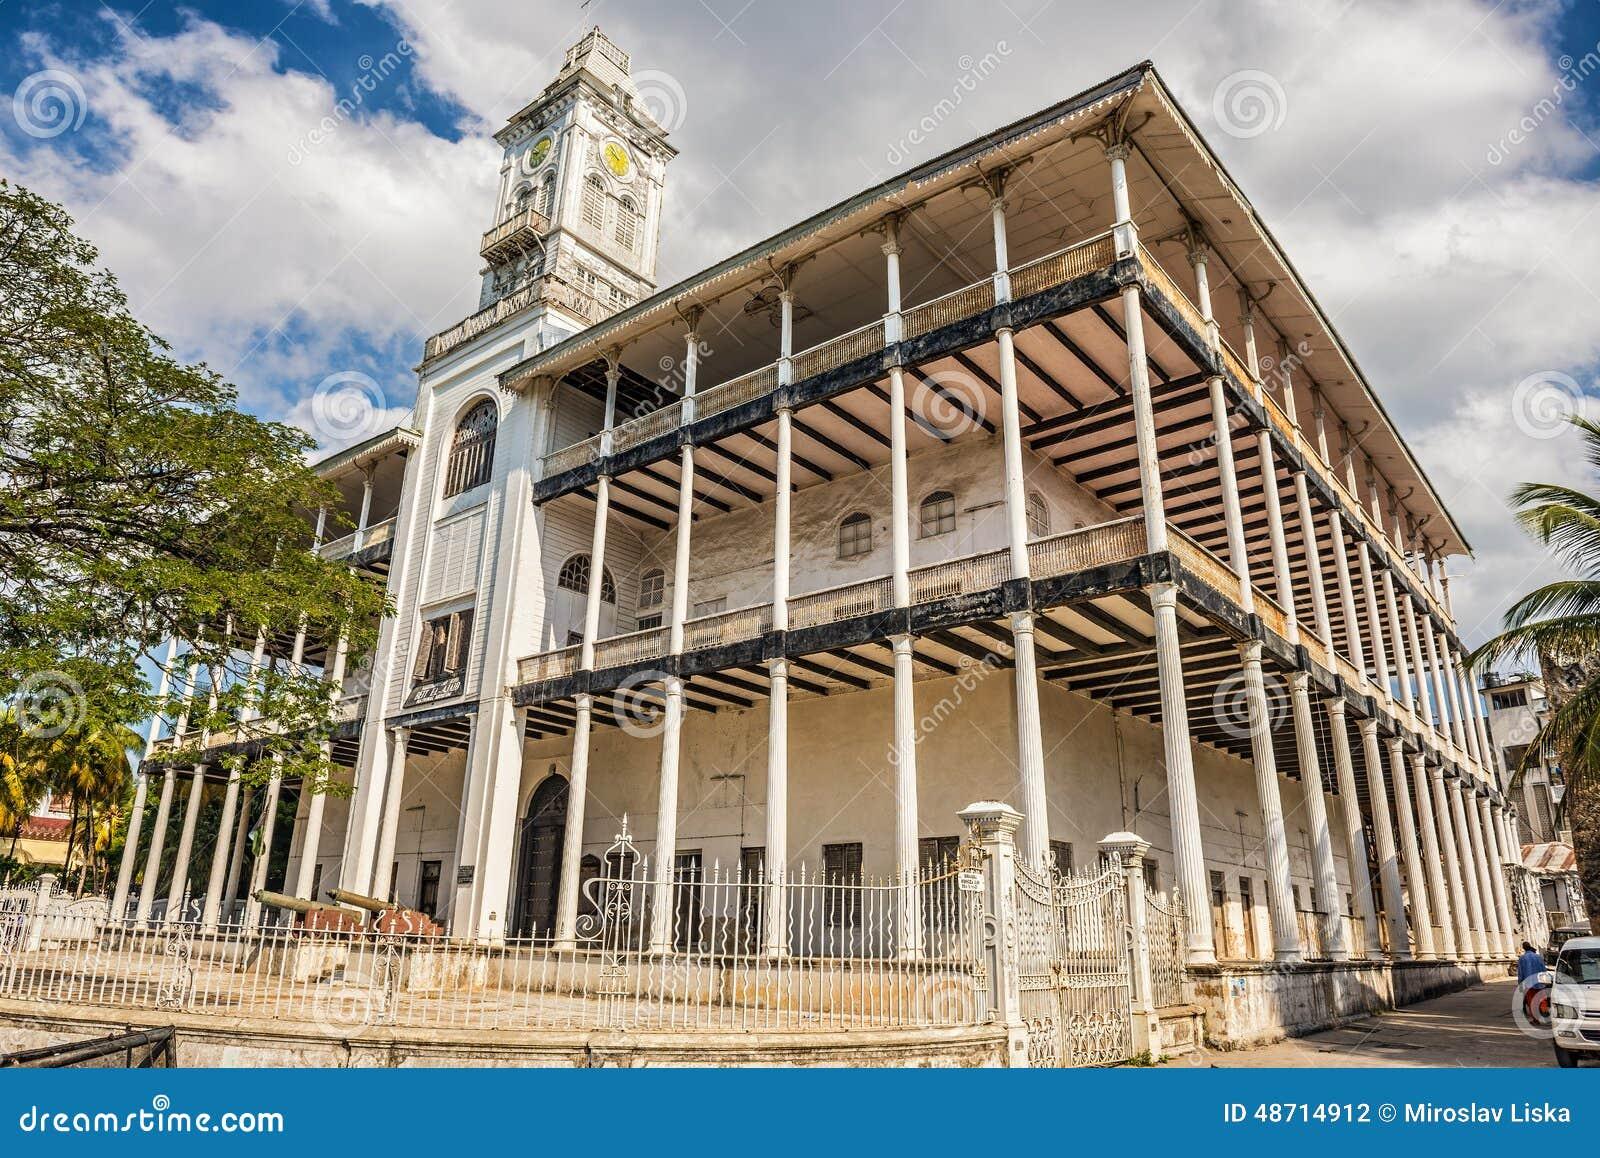 Tanzania houses design